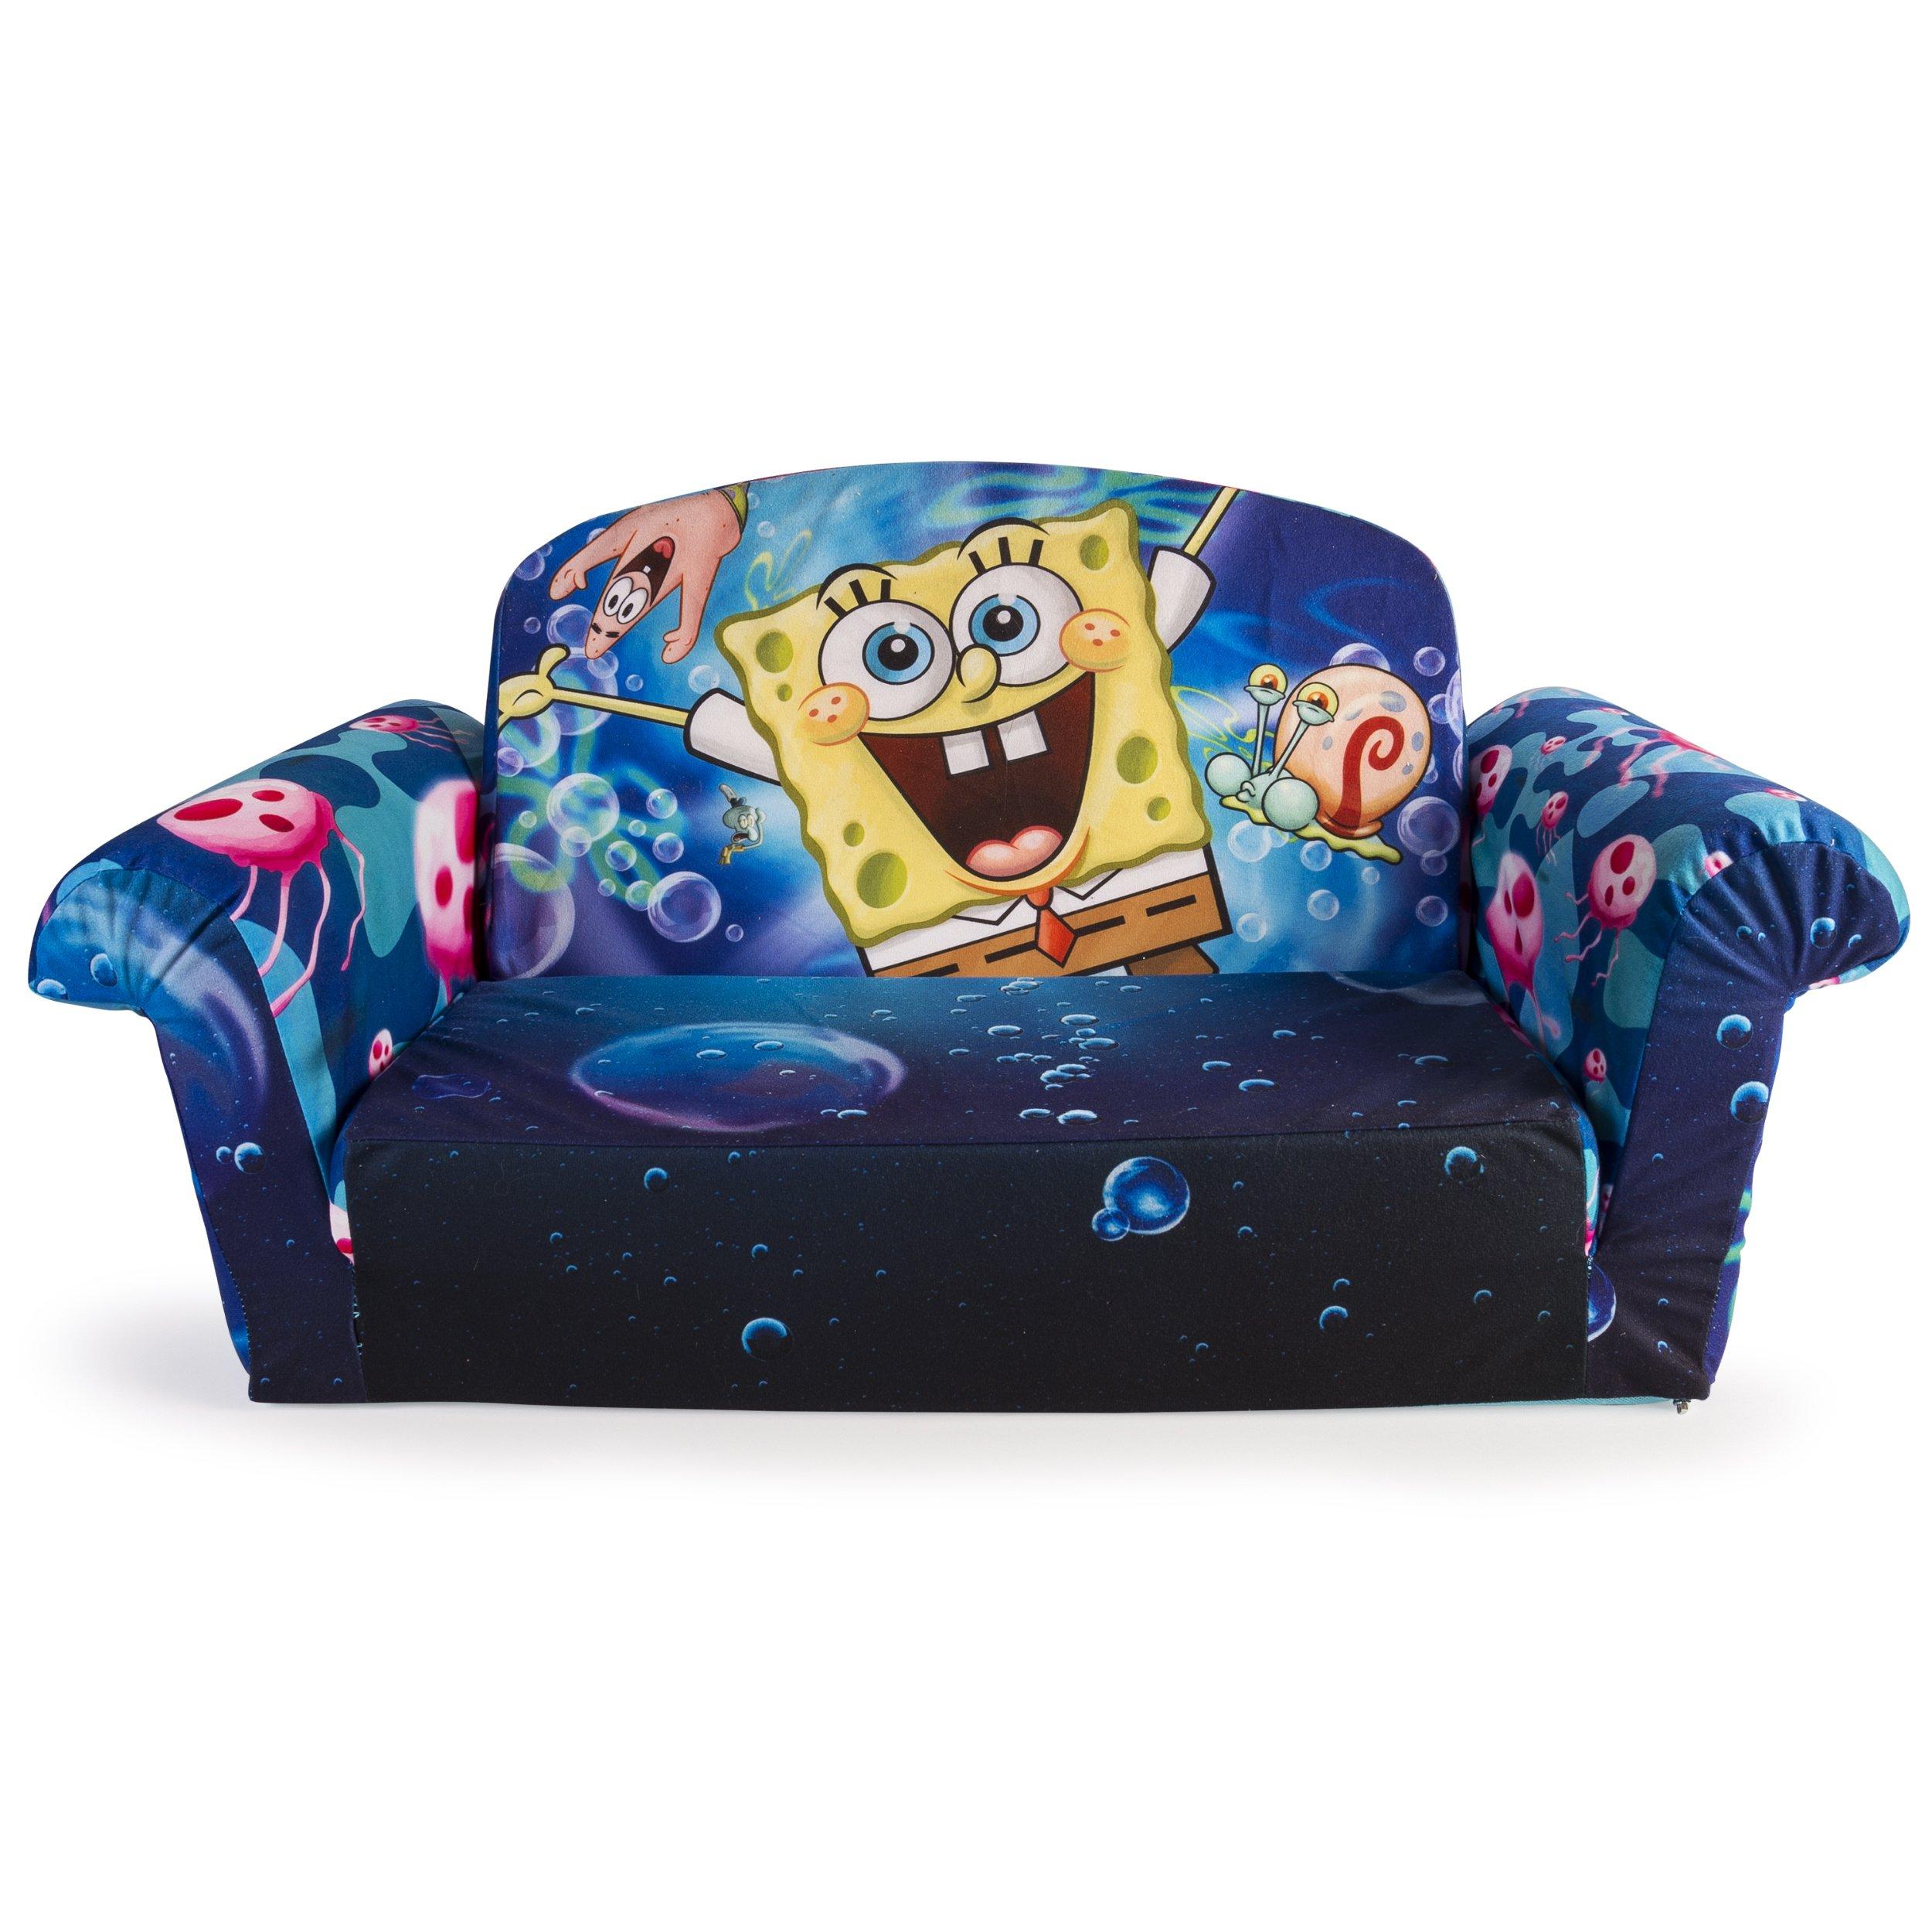 Marshmallow Furniture, Children's 2 in 1 Flip Open Foam Sofa, Nickelodeon SpongeBob Square Pants, by Spin Master